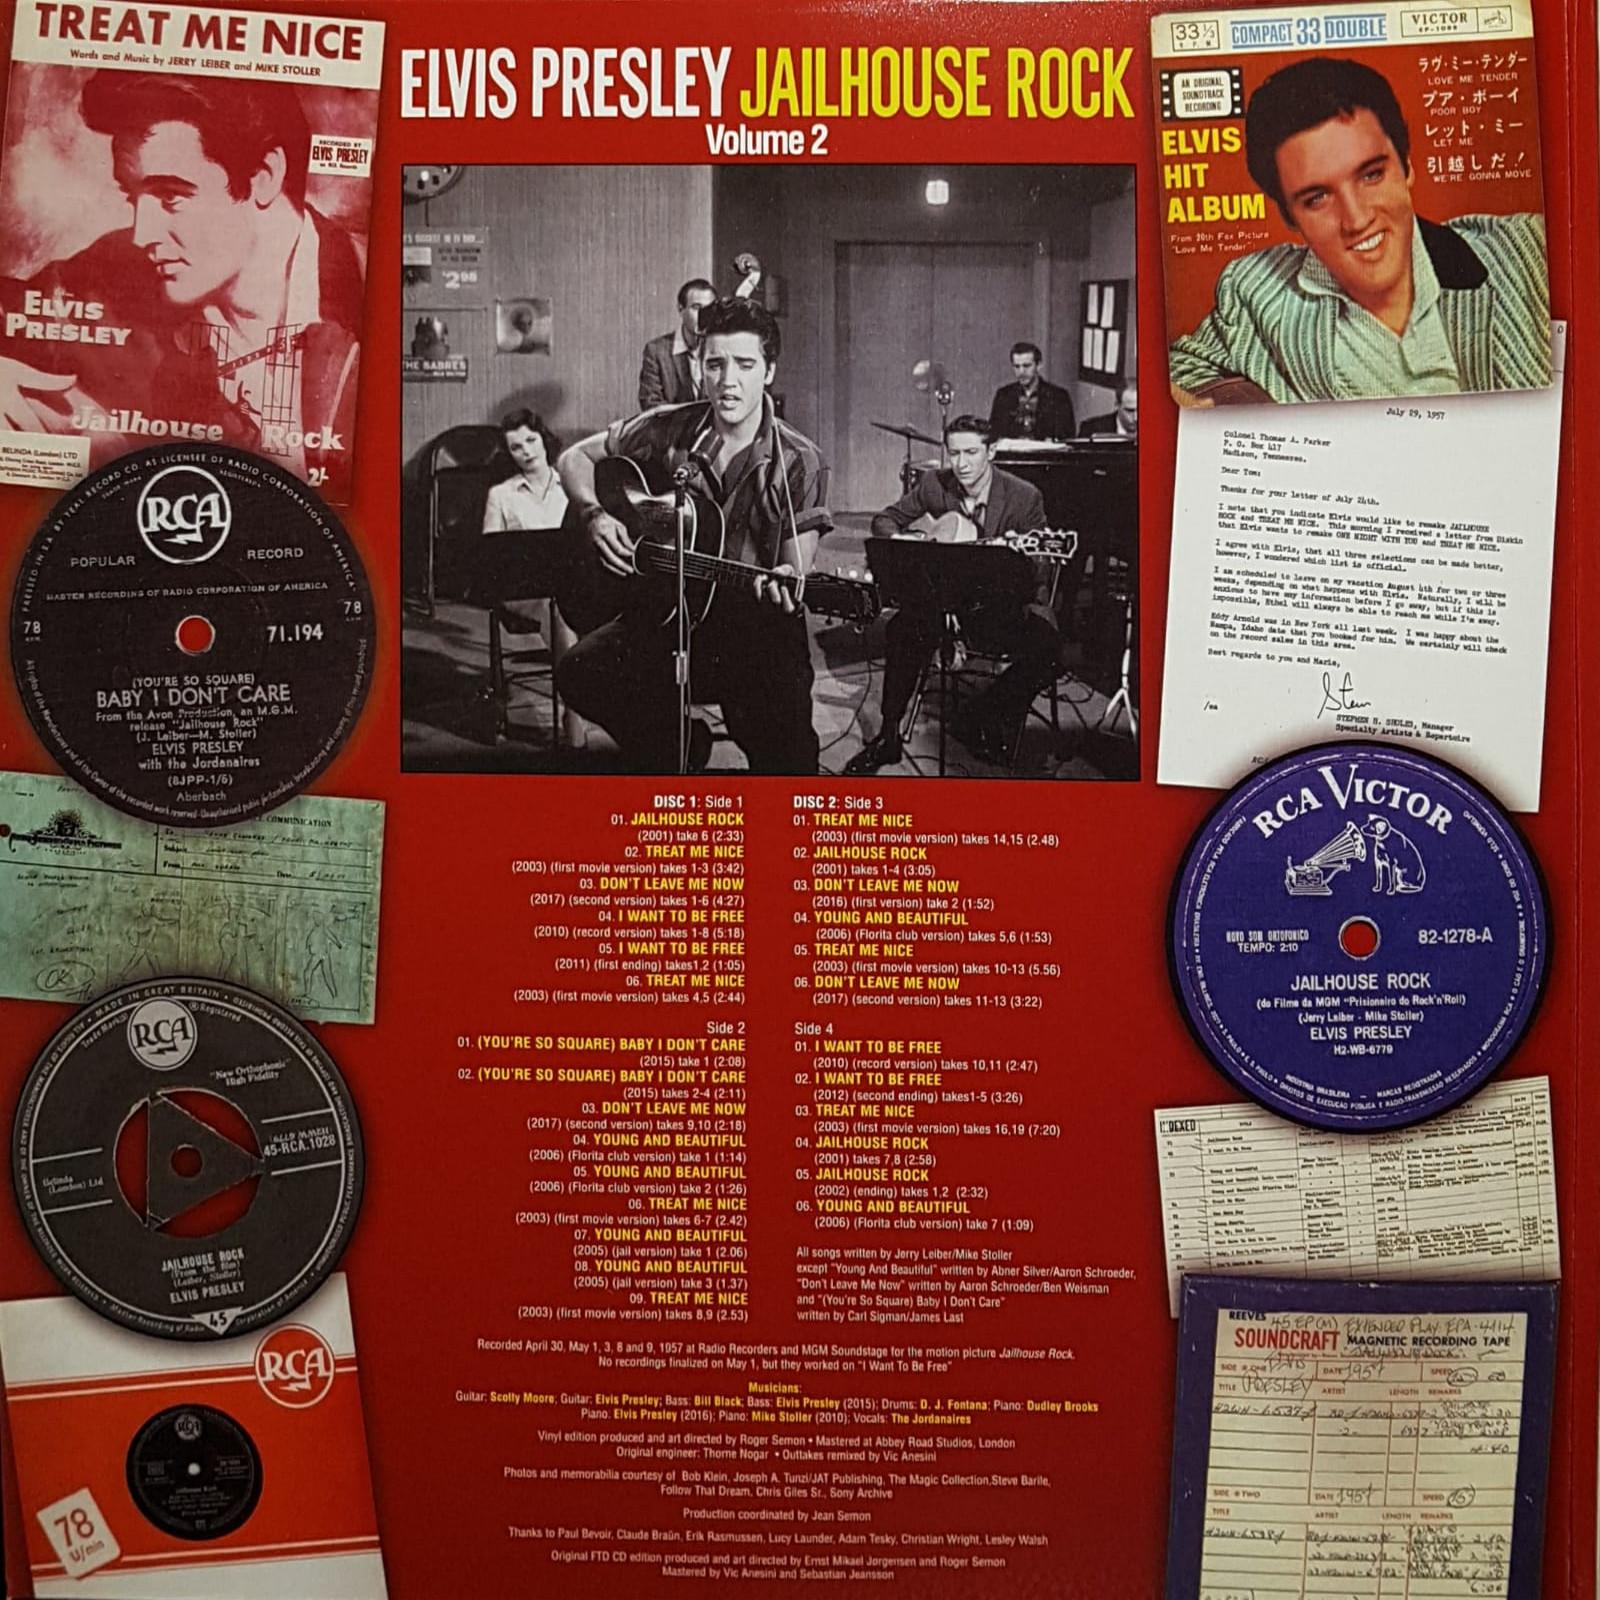 JAILHOUSE ROCK VOL. 2 Jailhouserock02ftd05gdk40